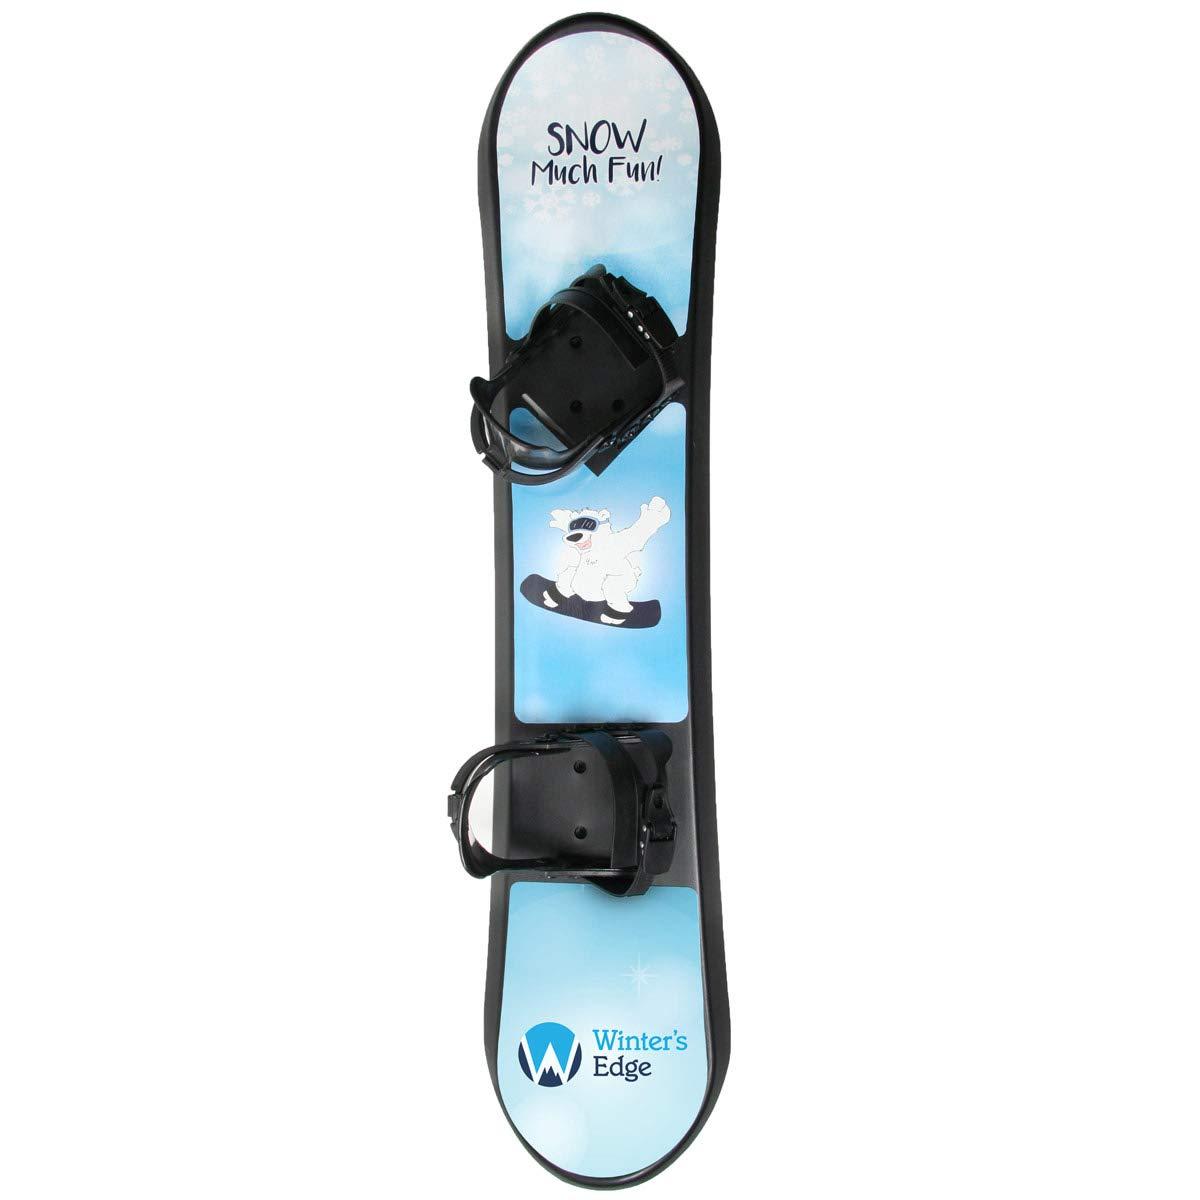 d4dbbe79e501d Amazon.com: Winter's Edge Snow Much Fun Kids Plastic Snowboard: Toys & Games